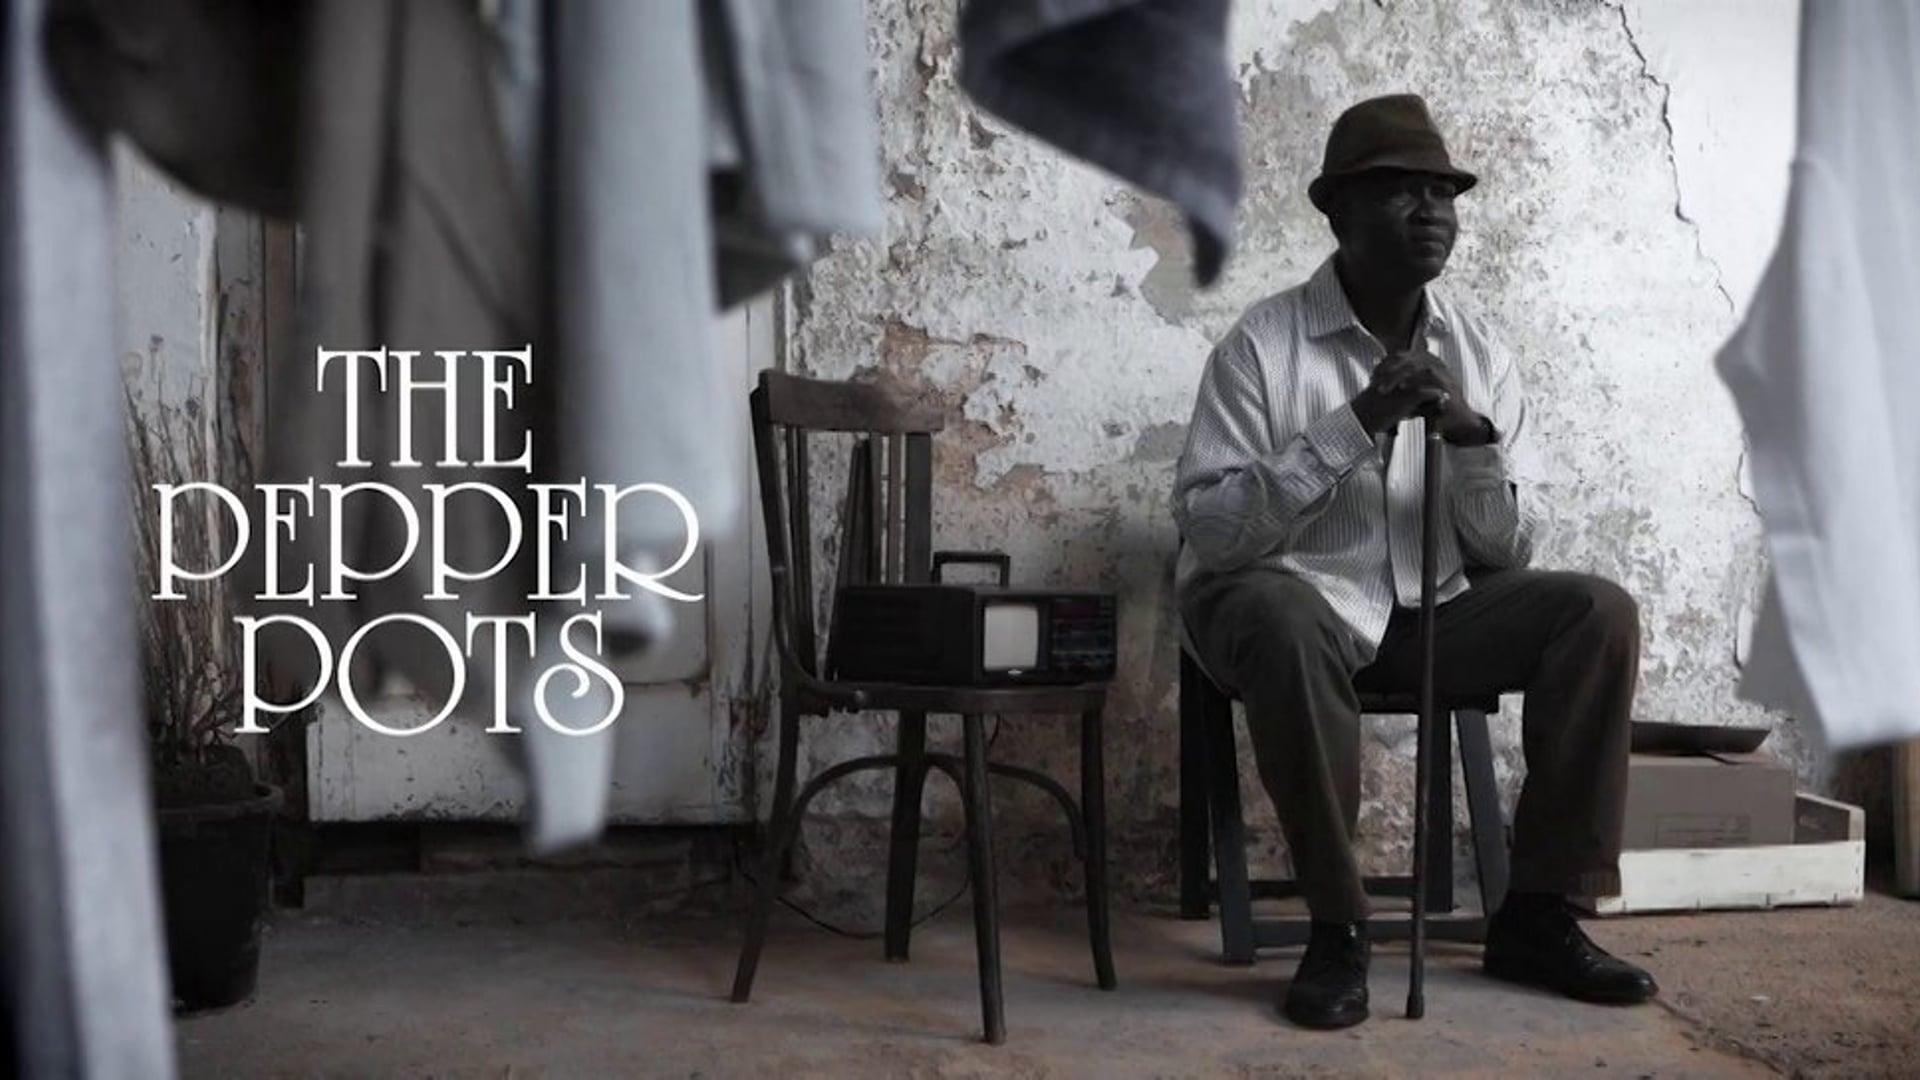 THE PEPPER POTS videoclip